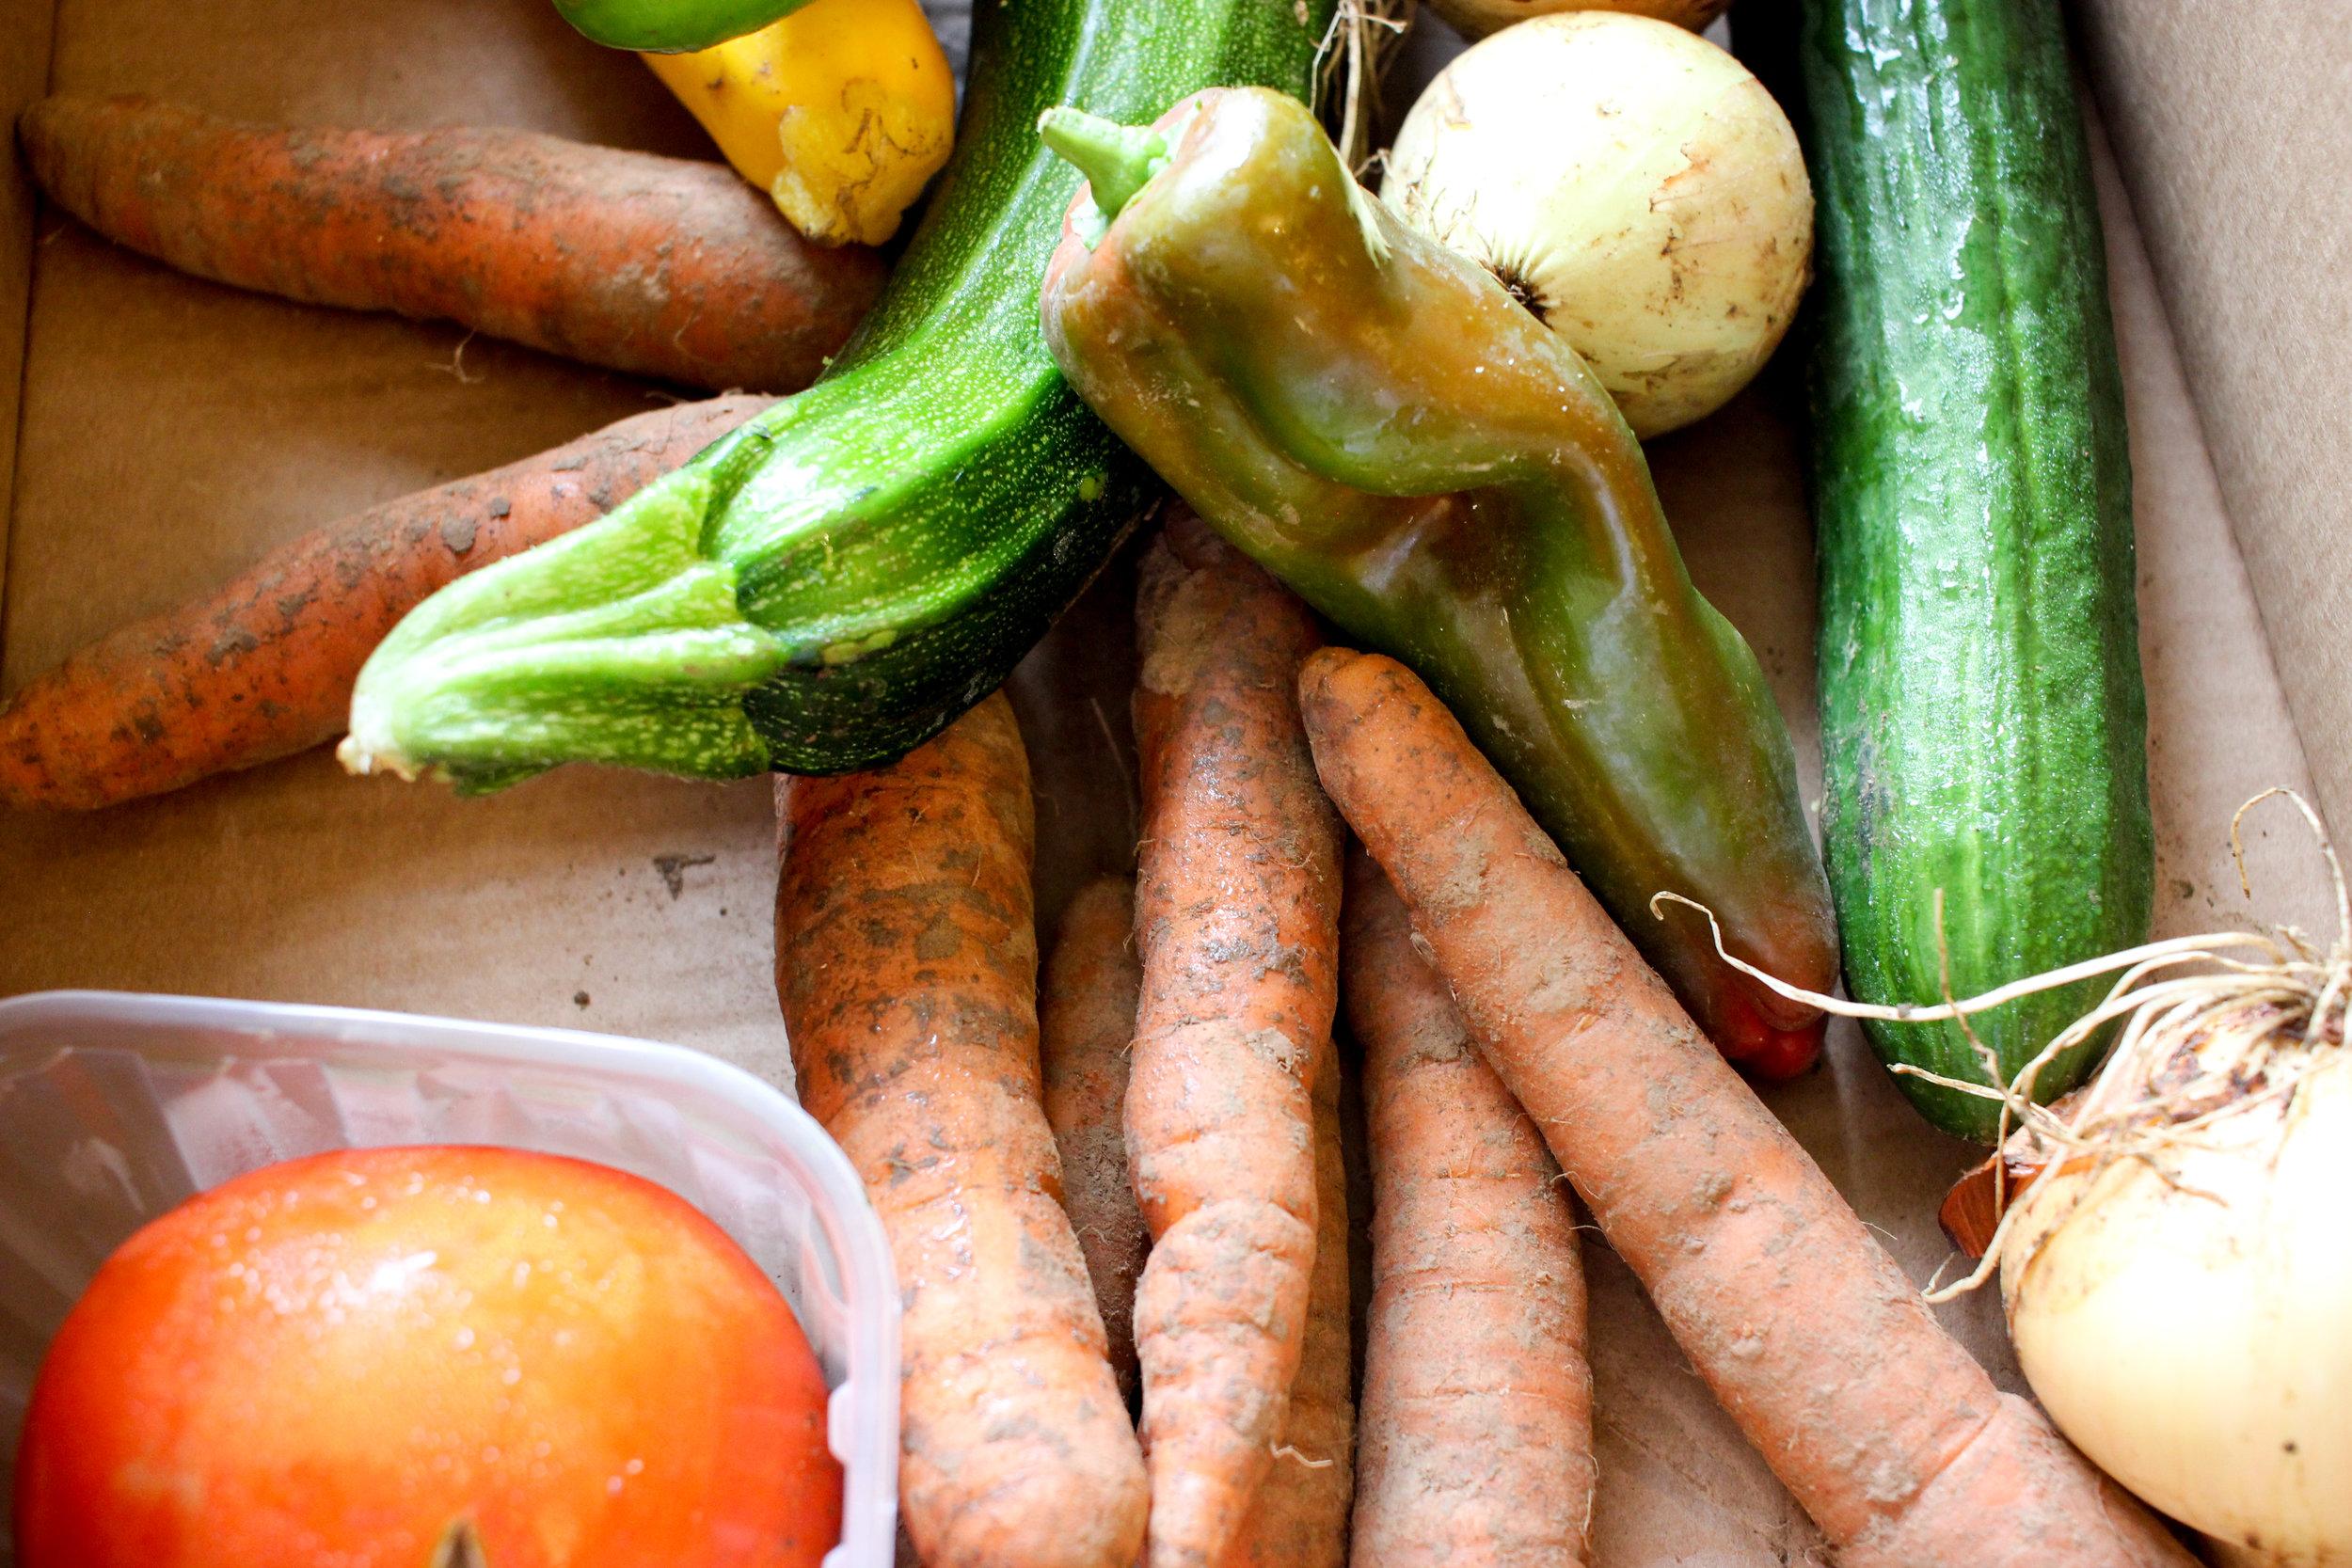 Farmdrop Food Shopping Review